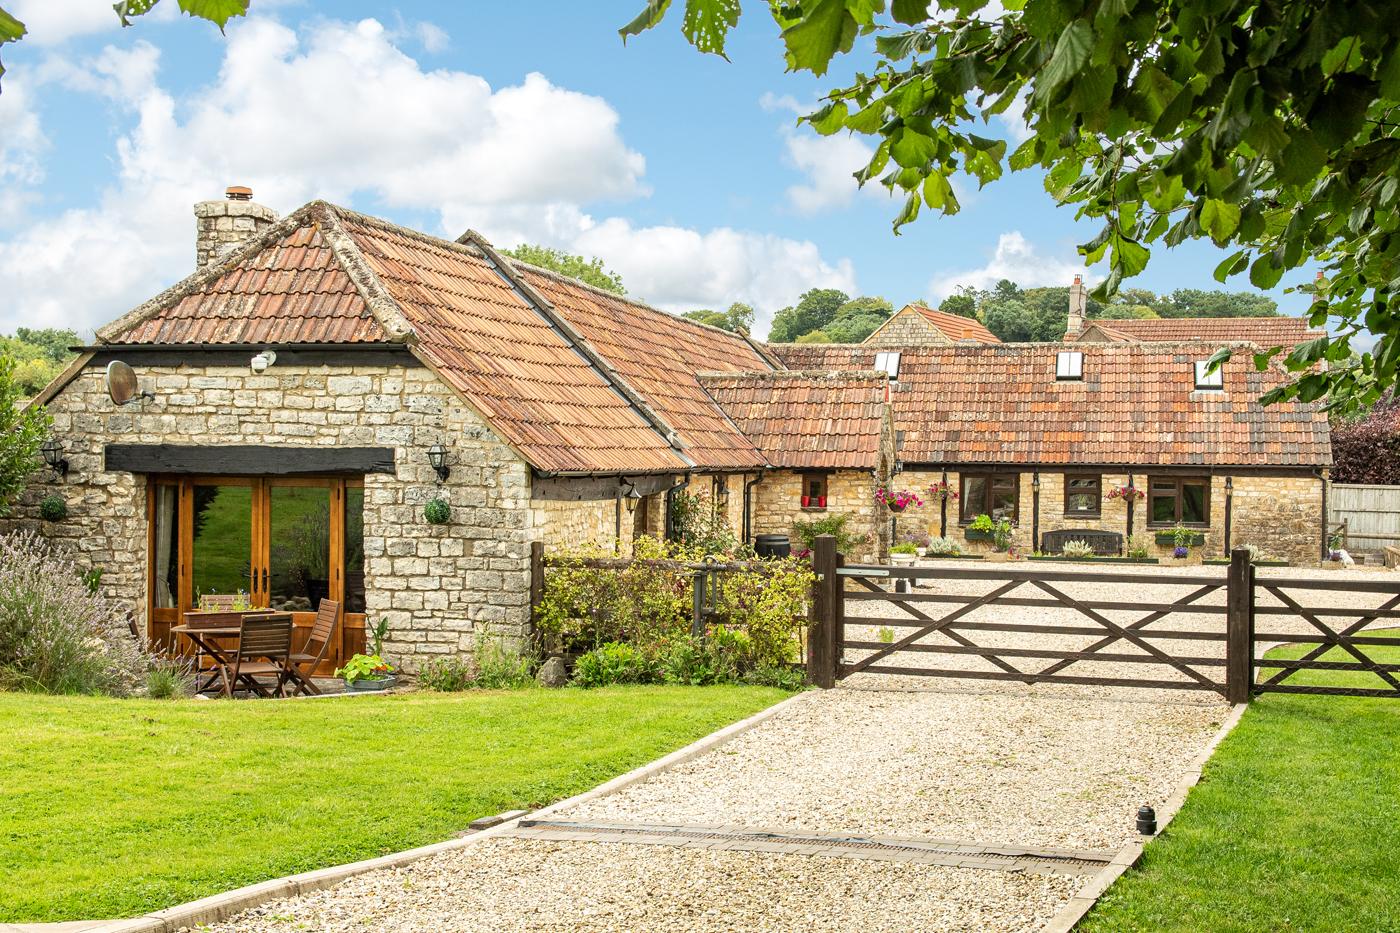 Property for sale near Bristol